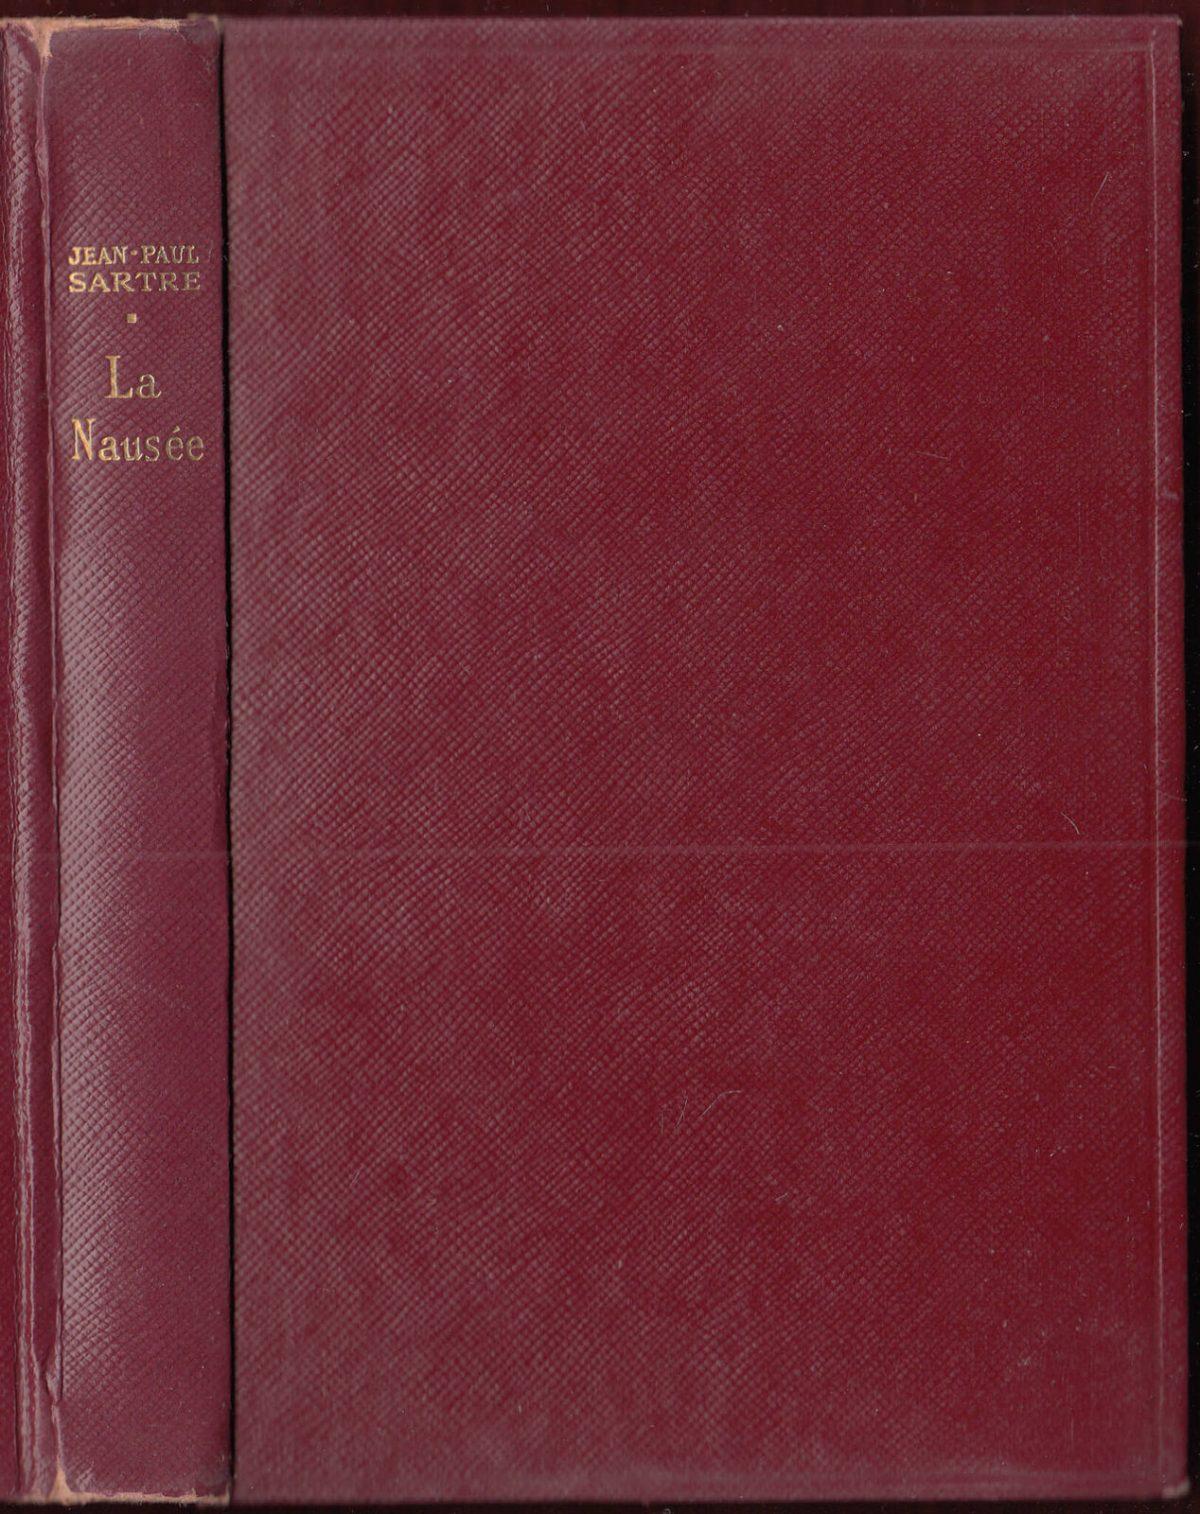 La-Nausee-Jean-Paul-Sartre-1950-Novel-Philosophy-Signed-Copy-Nausea-401702206780-3